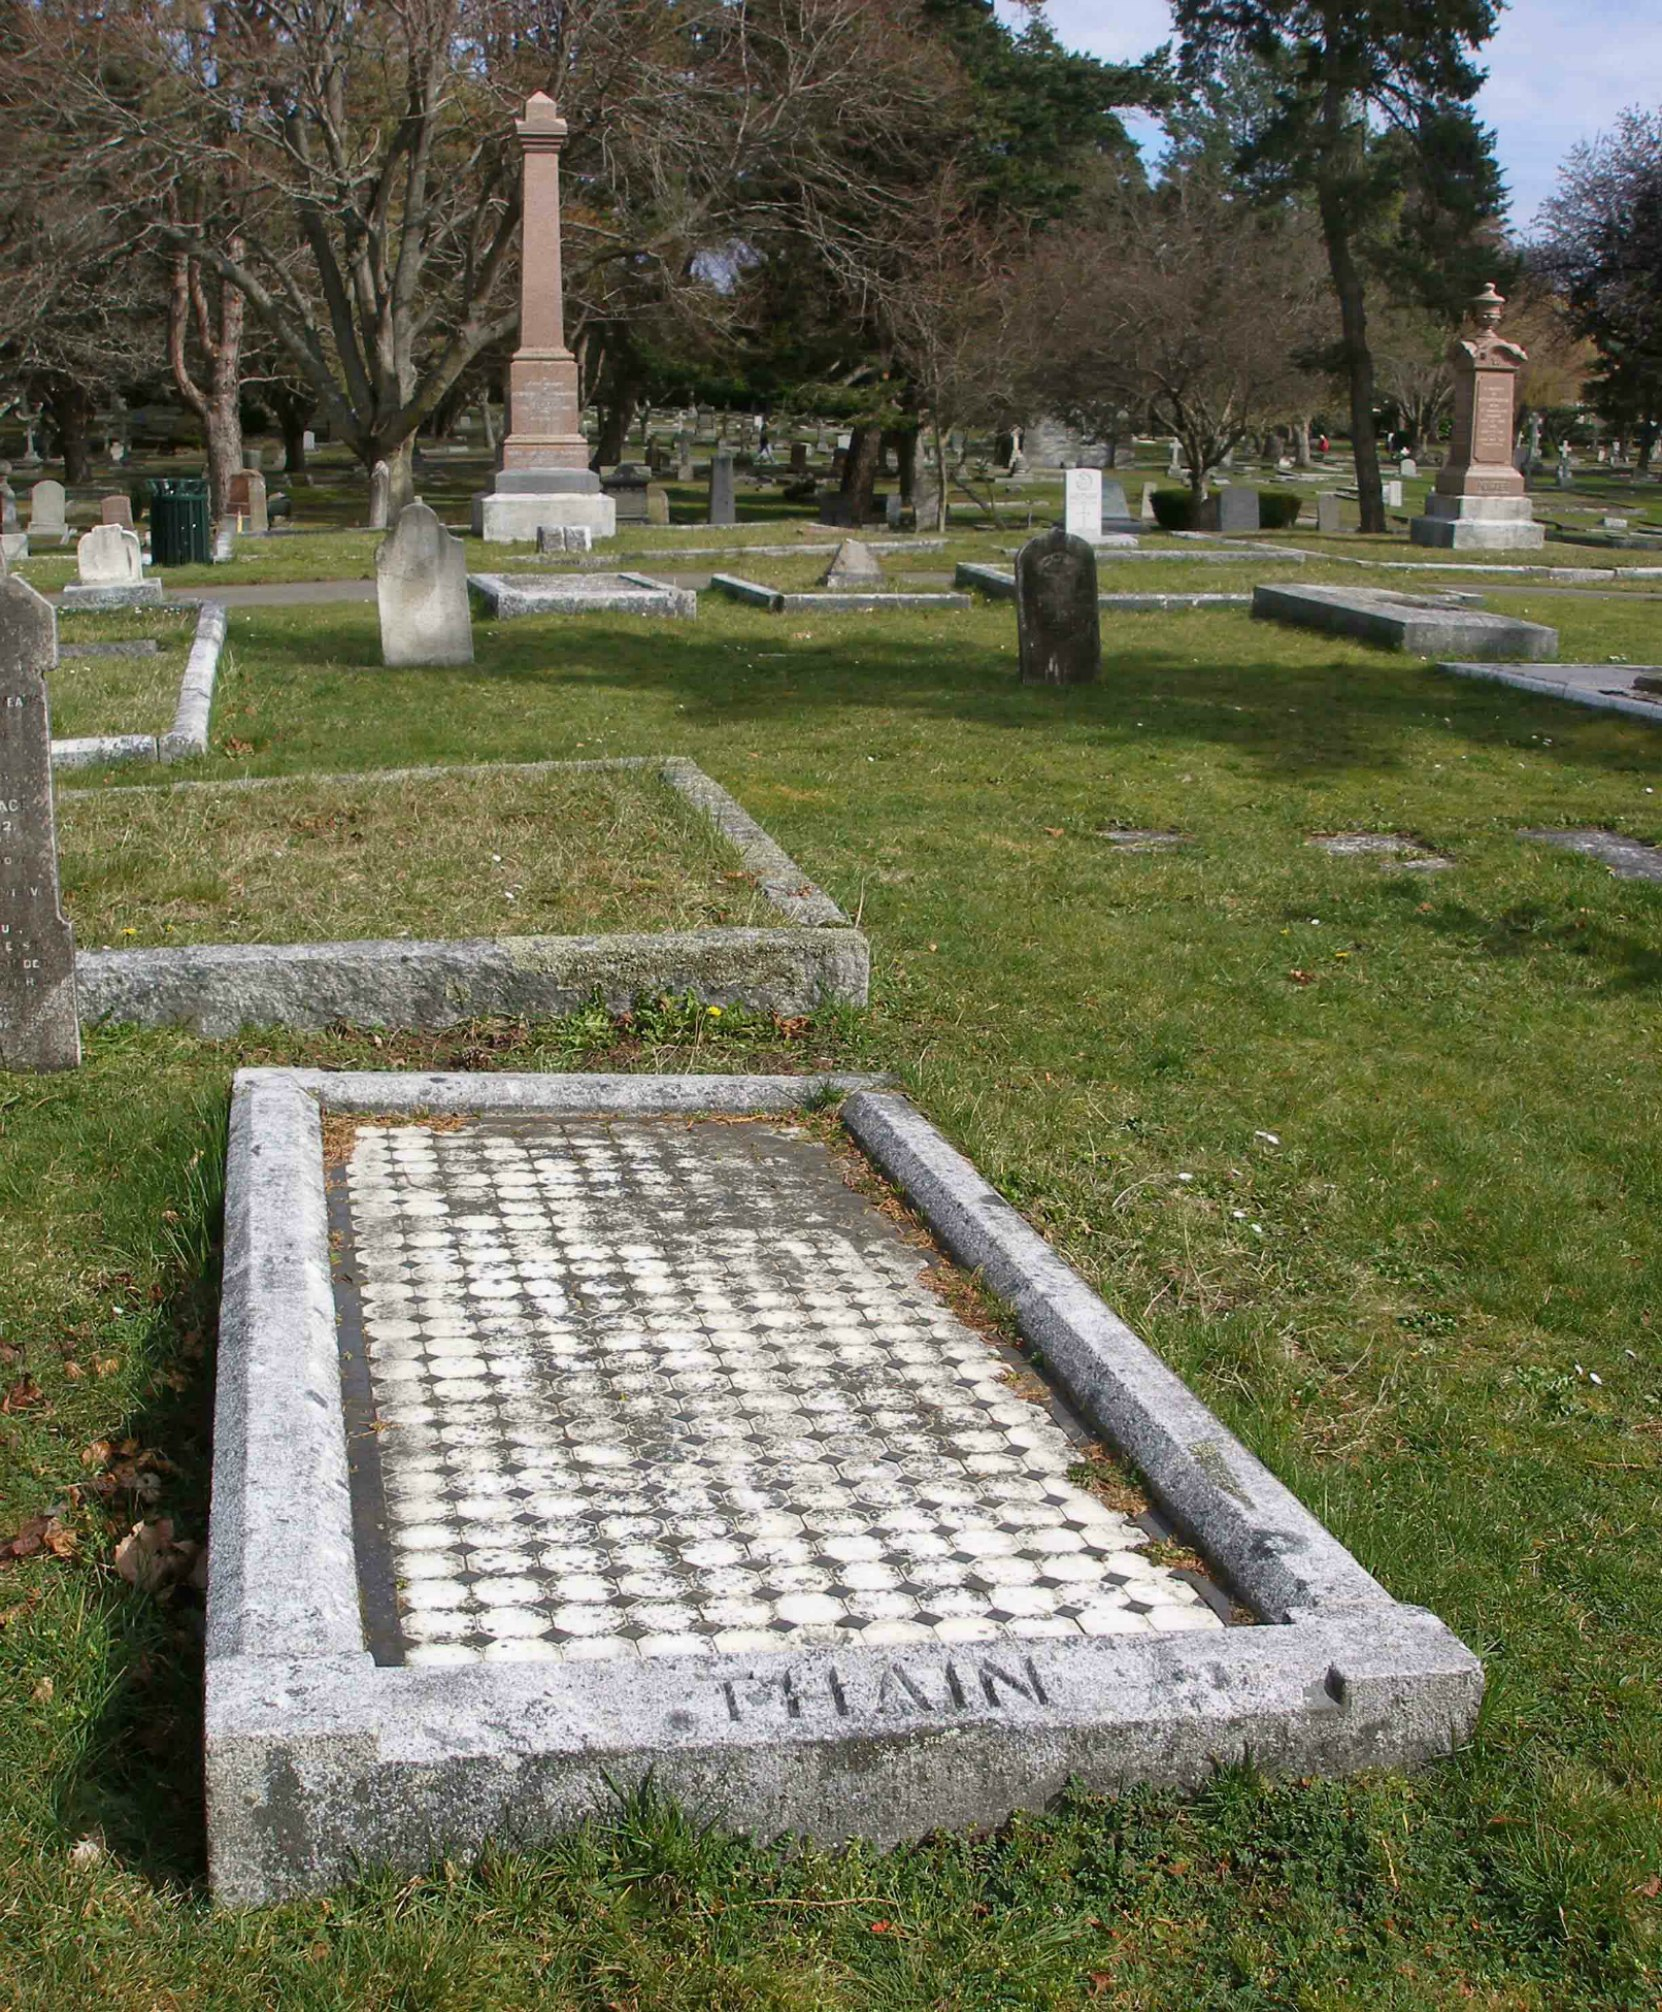 James Nealton Thain grave, Ross Bay Cemetery, Victoria, B.C.